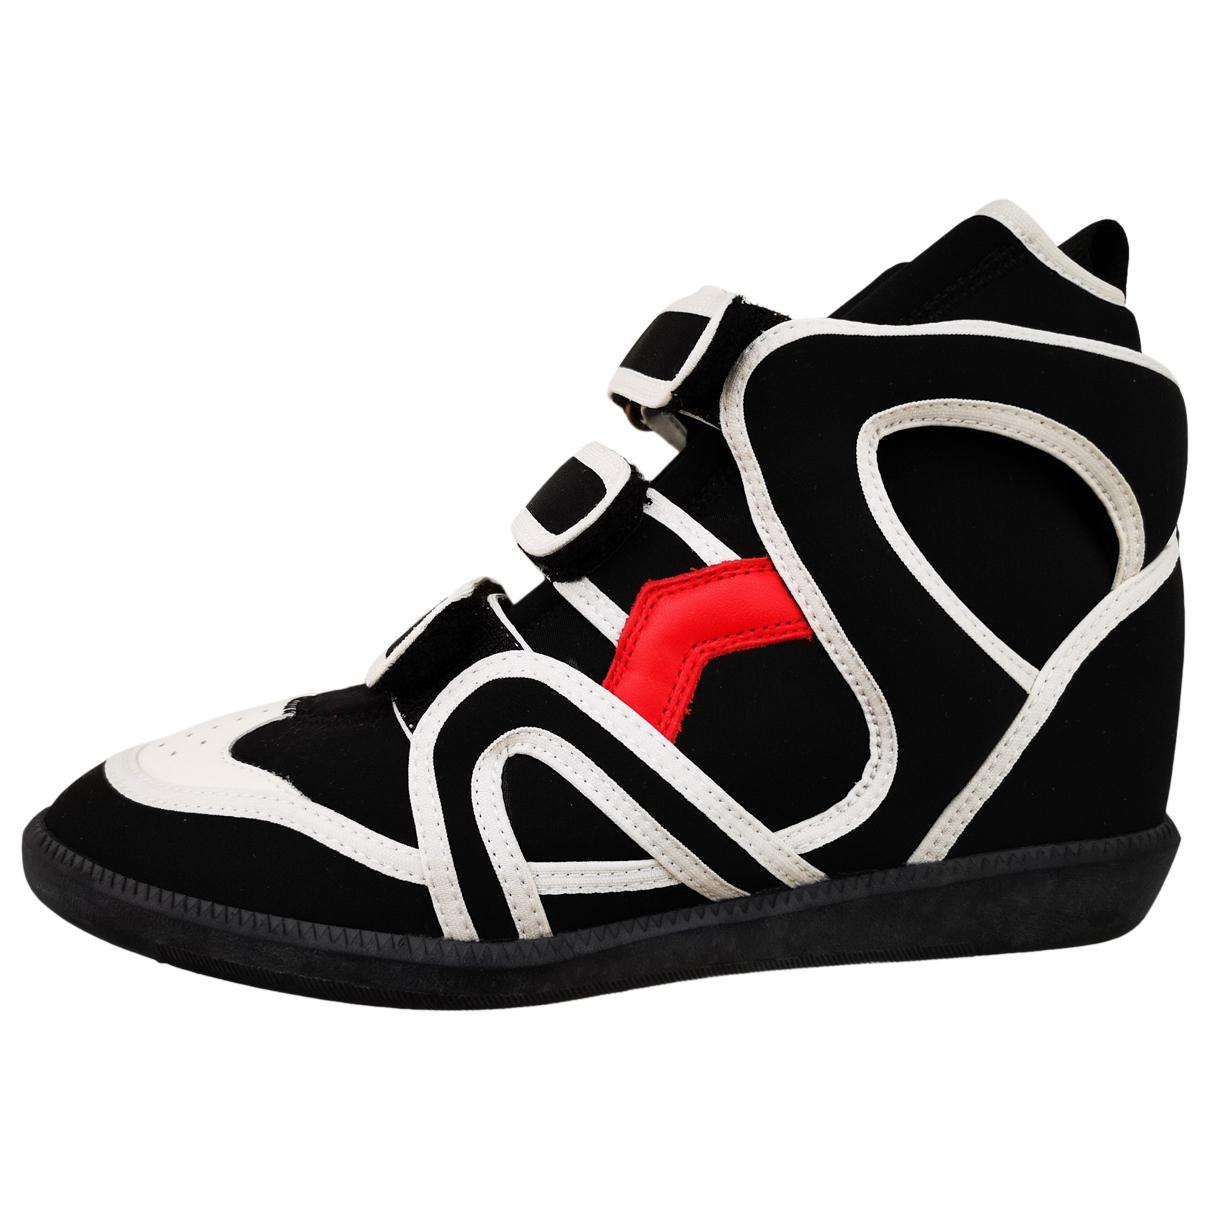 Isabel Marant - Baskets Buckee pour femme en cuir - noir